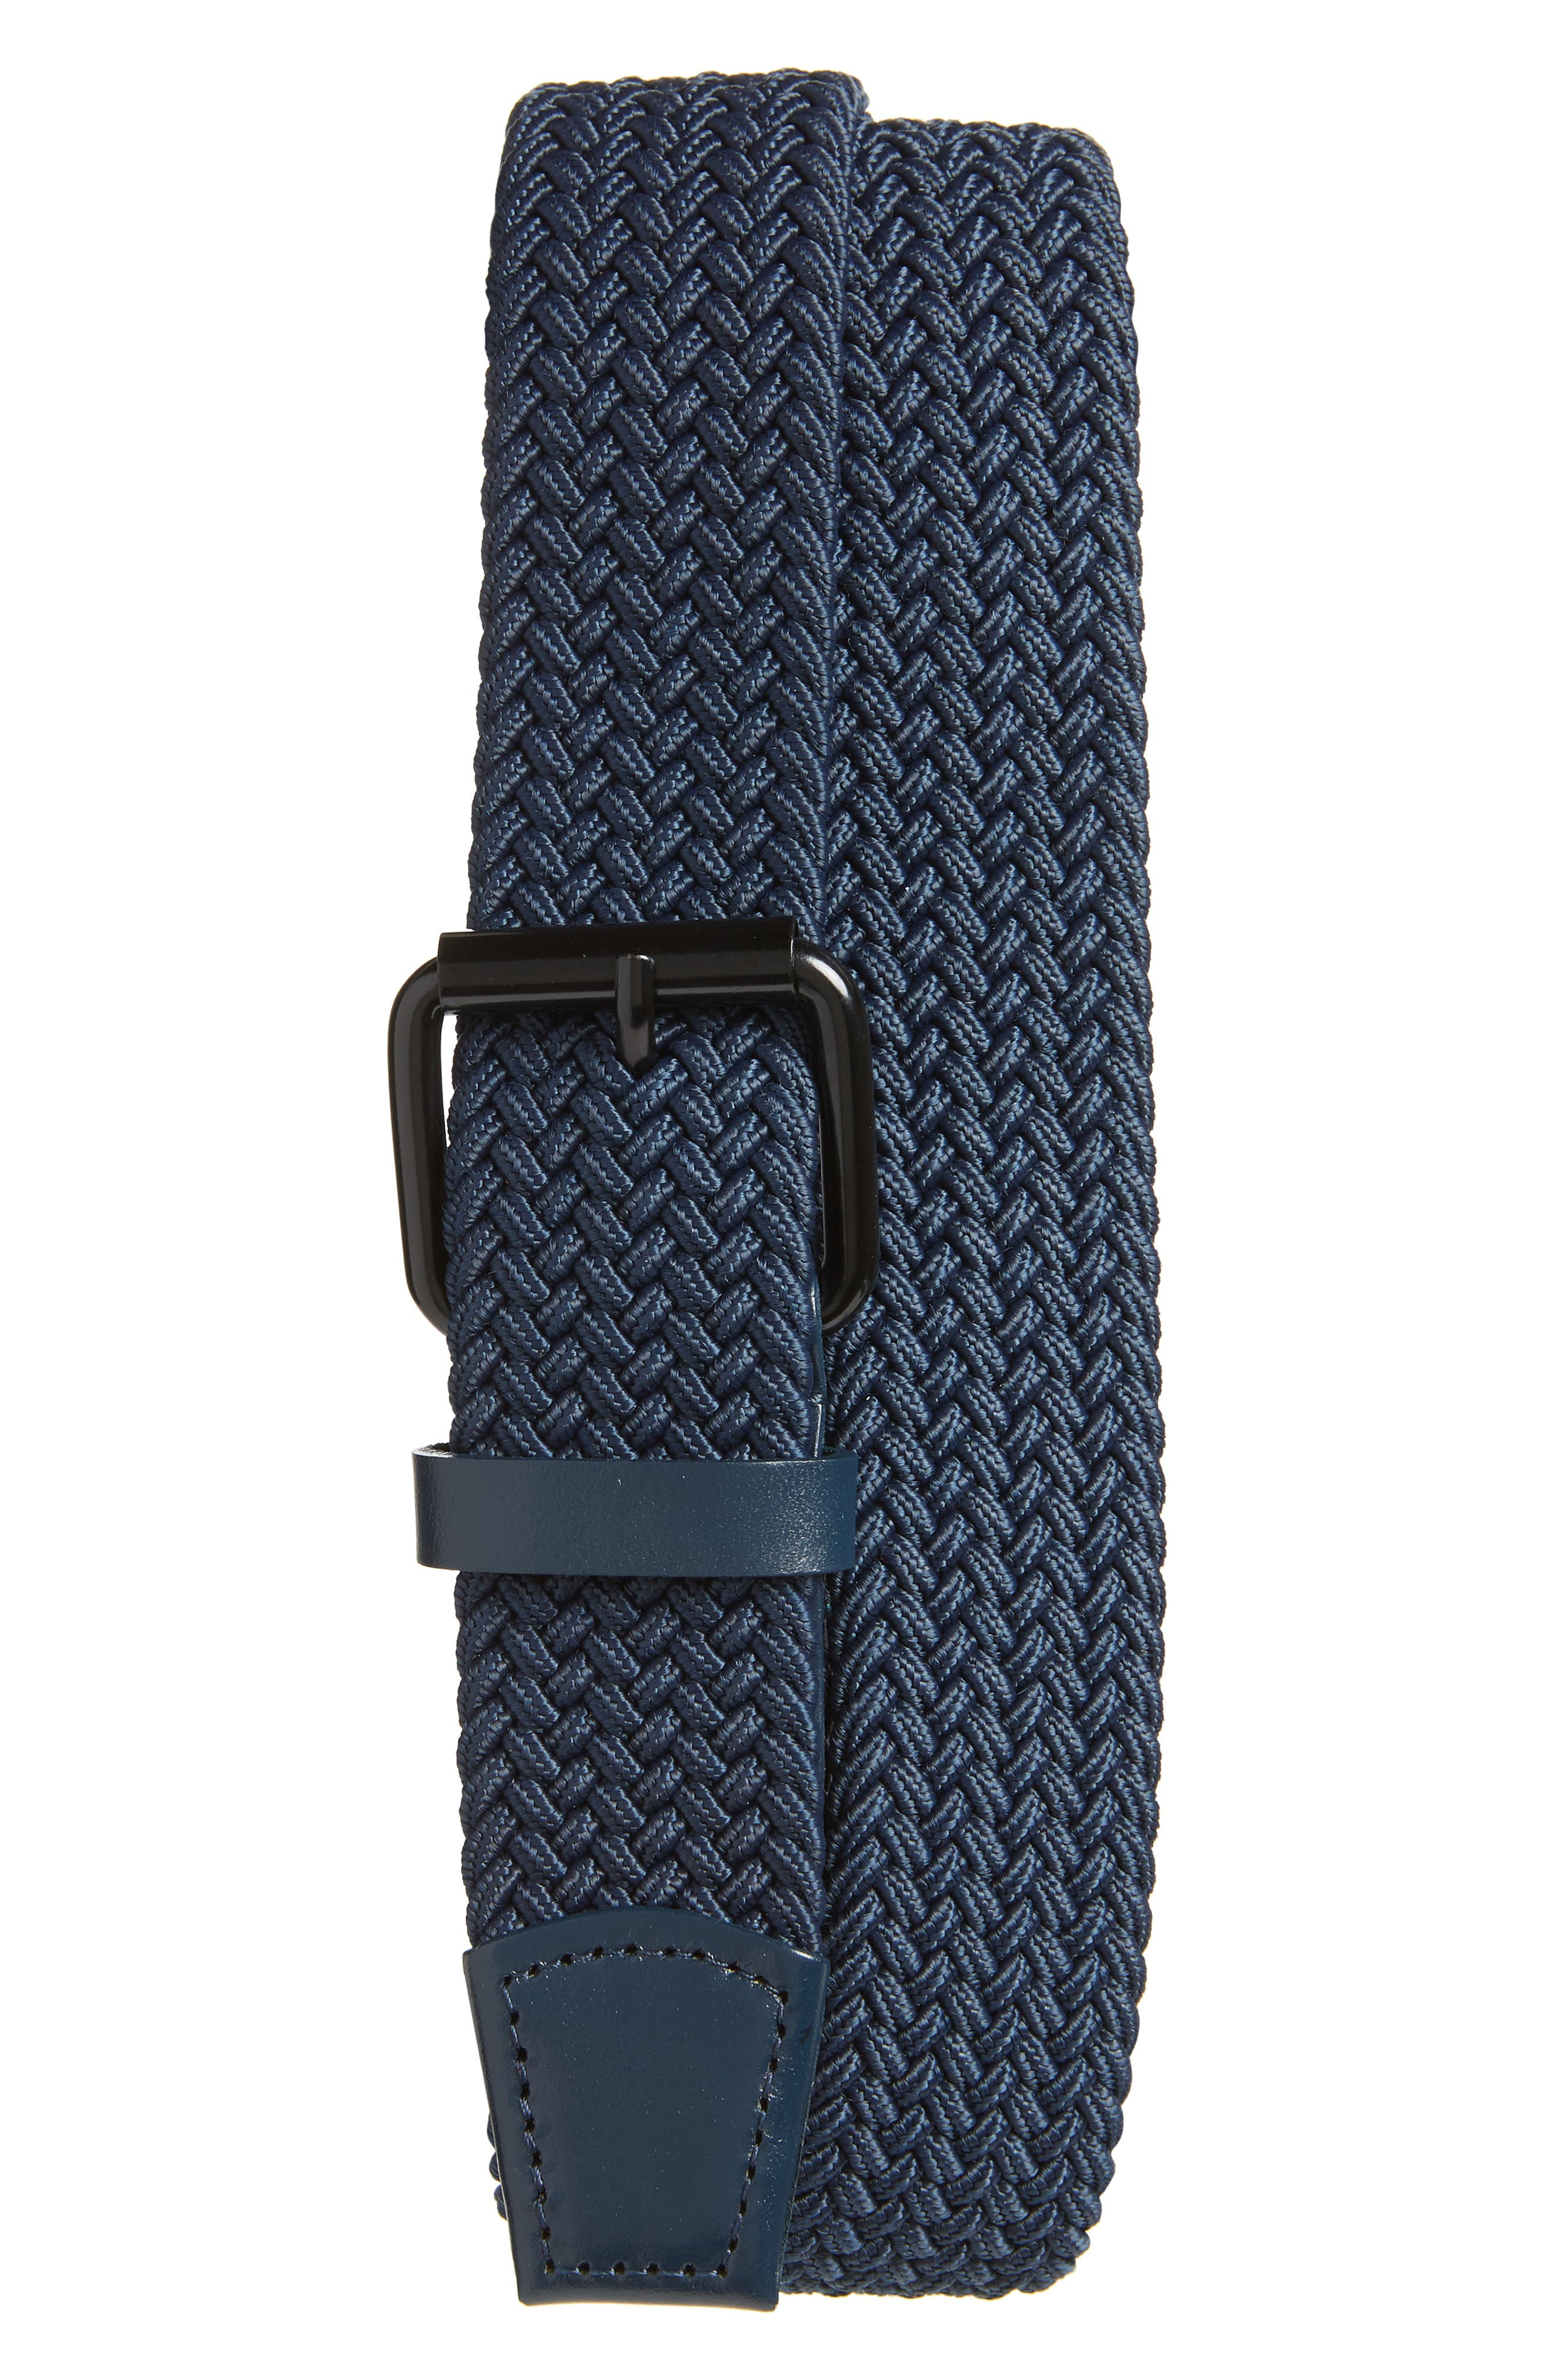 Saturdays Nyc Shane Woven Belt, Size One Size - Indigo Dye